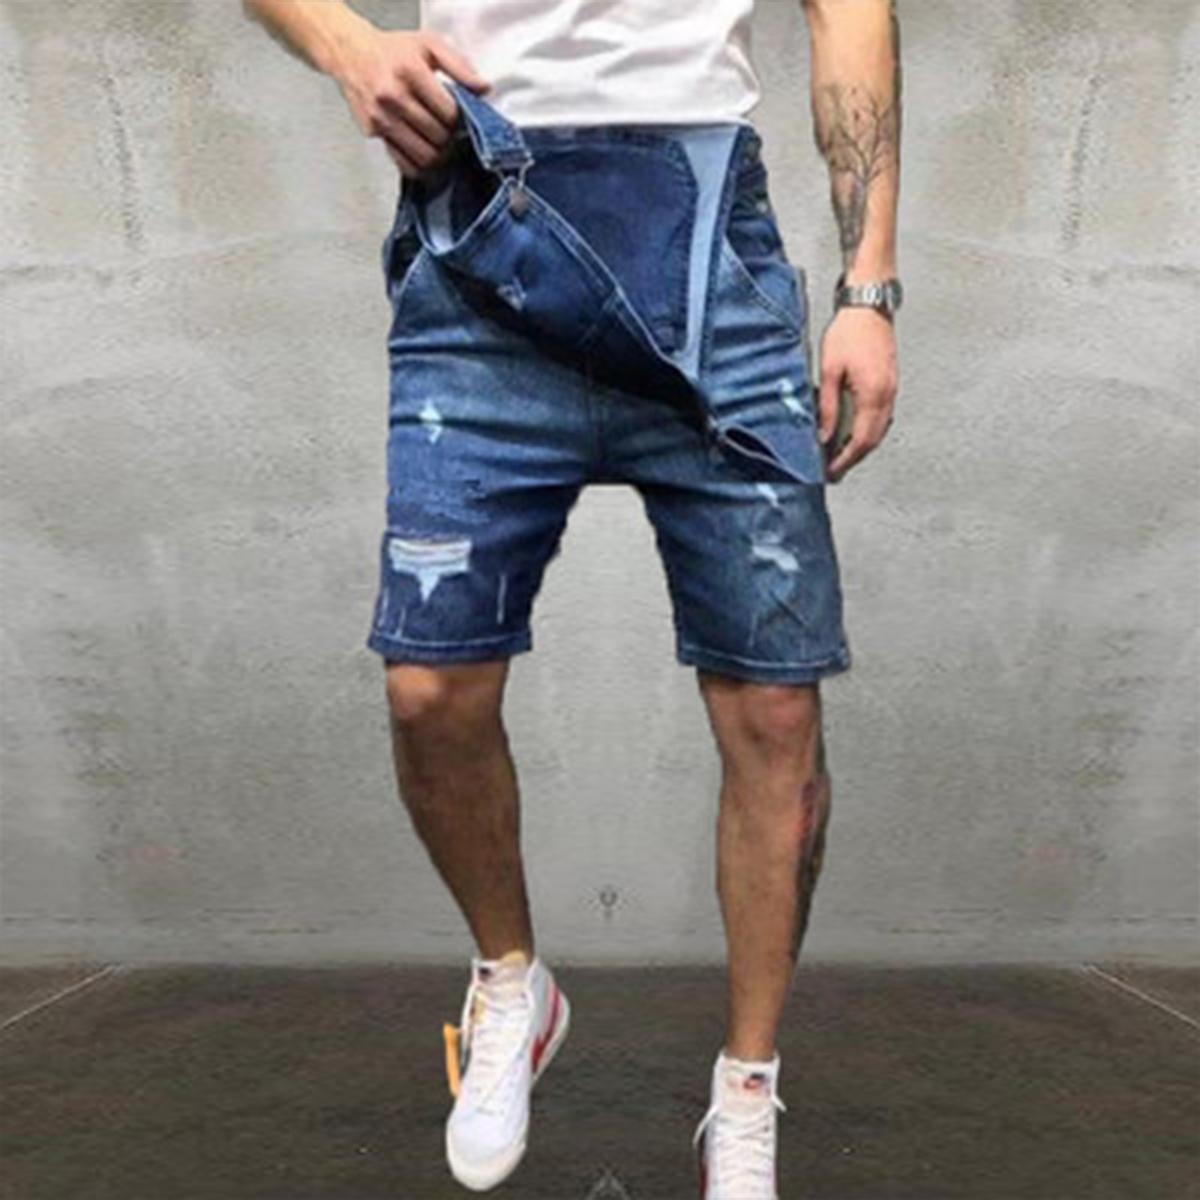 Correa-De-Hombre-Denim-Jeans-Mono-Mono-corto-Dungaree-Pantalones-Cortos-Deshilachados-Babero-En miniatura 14